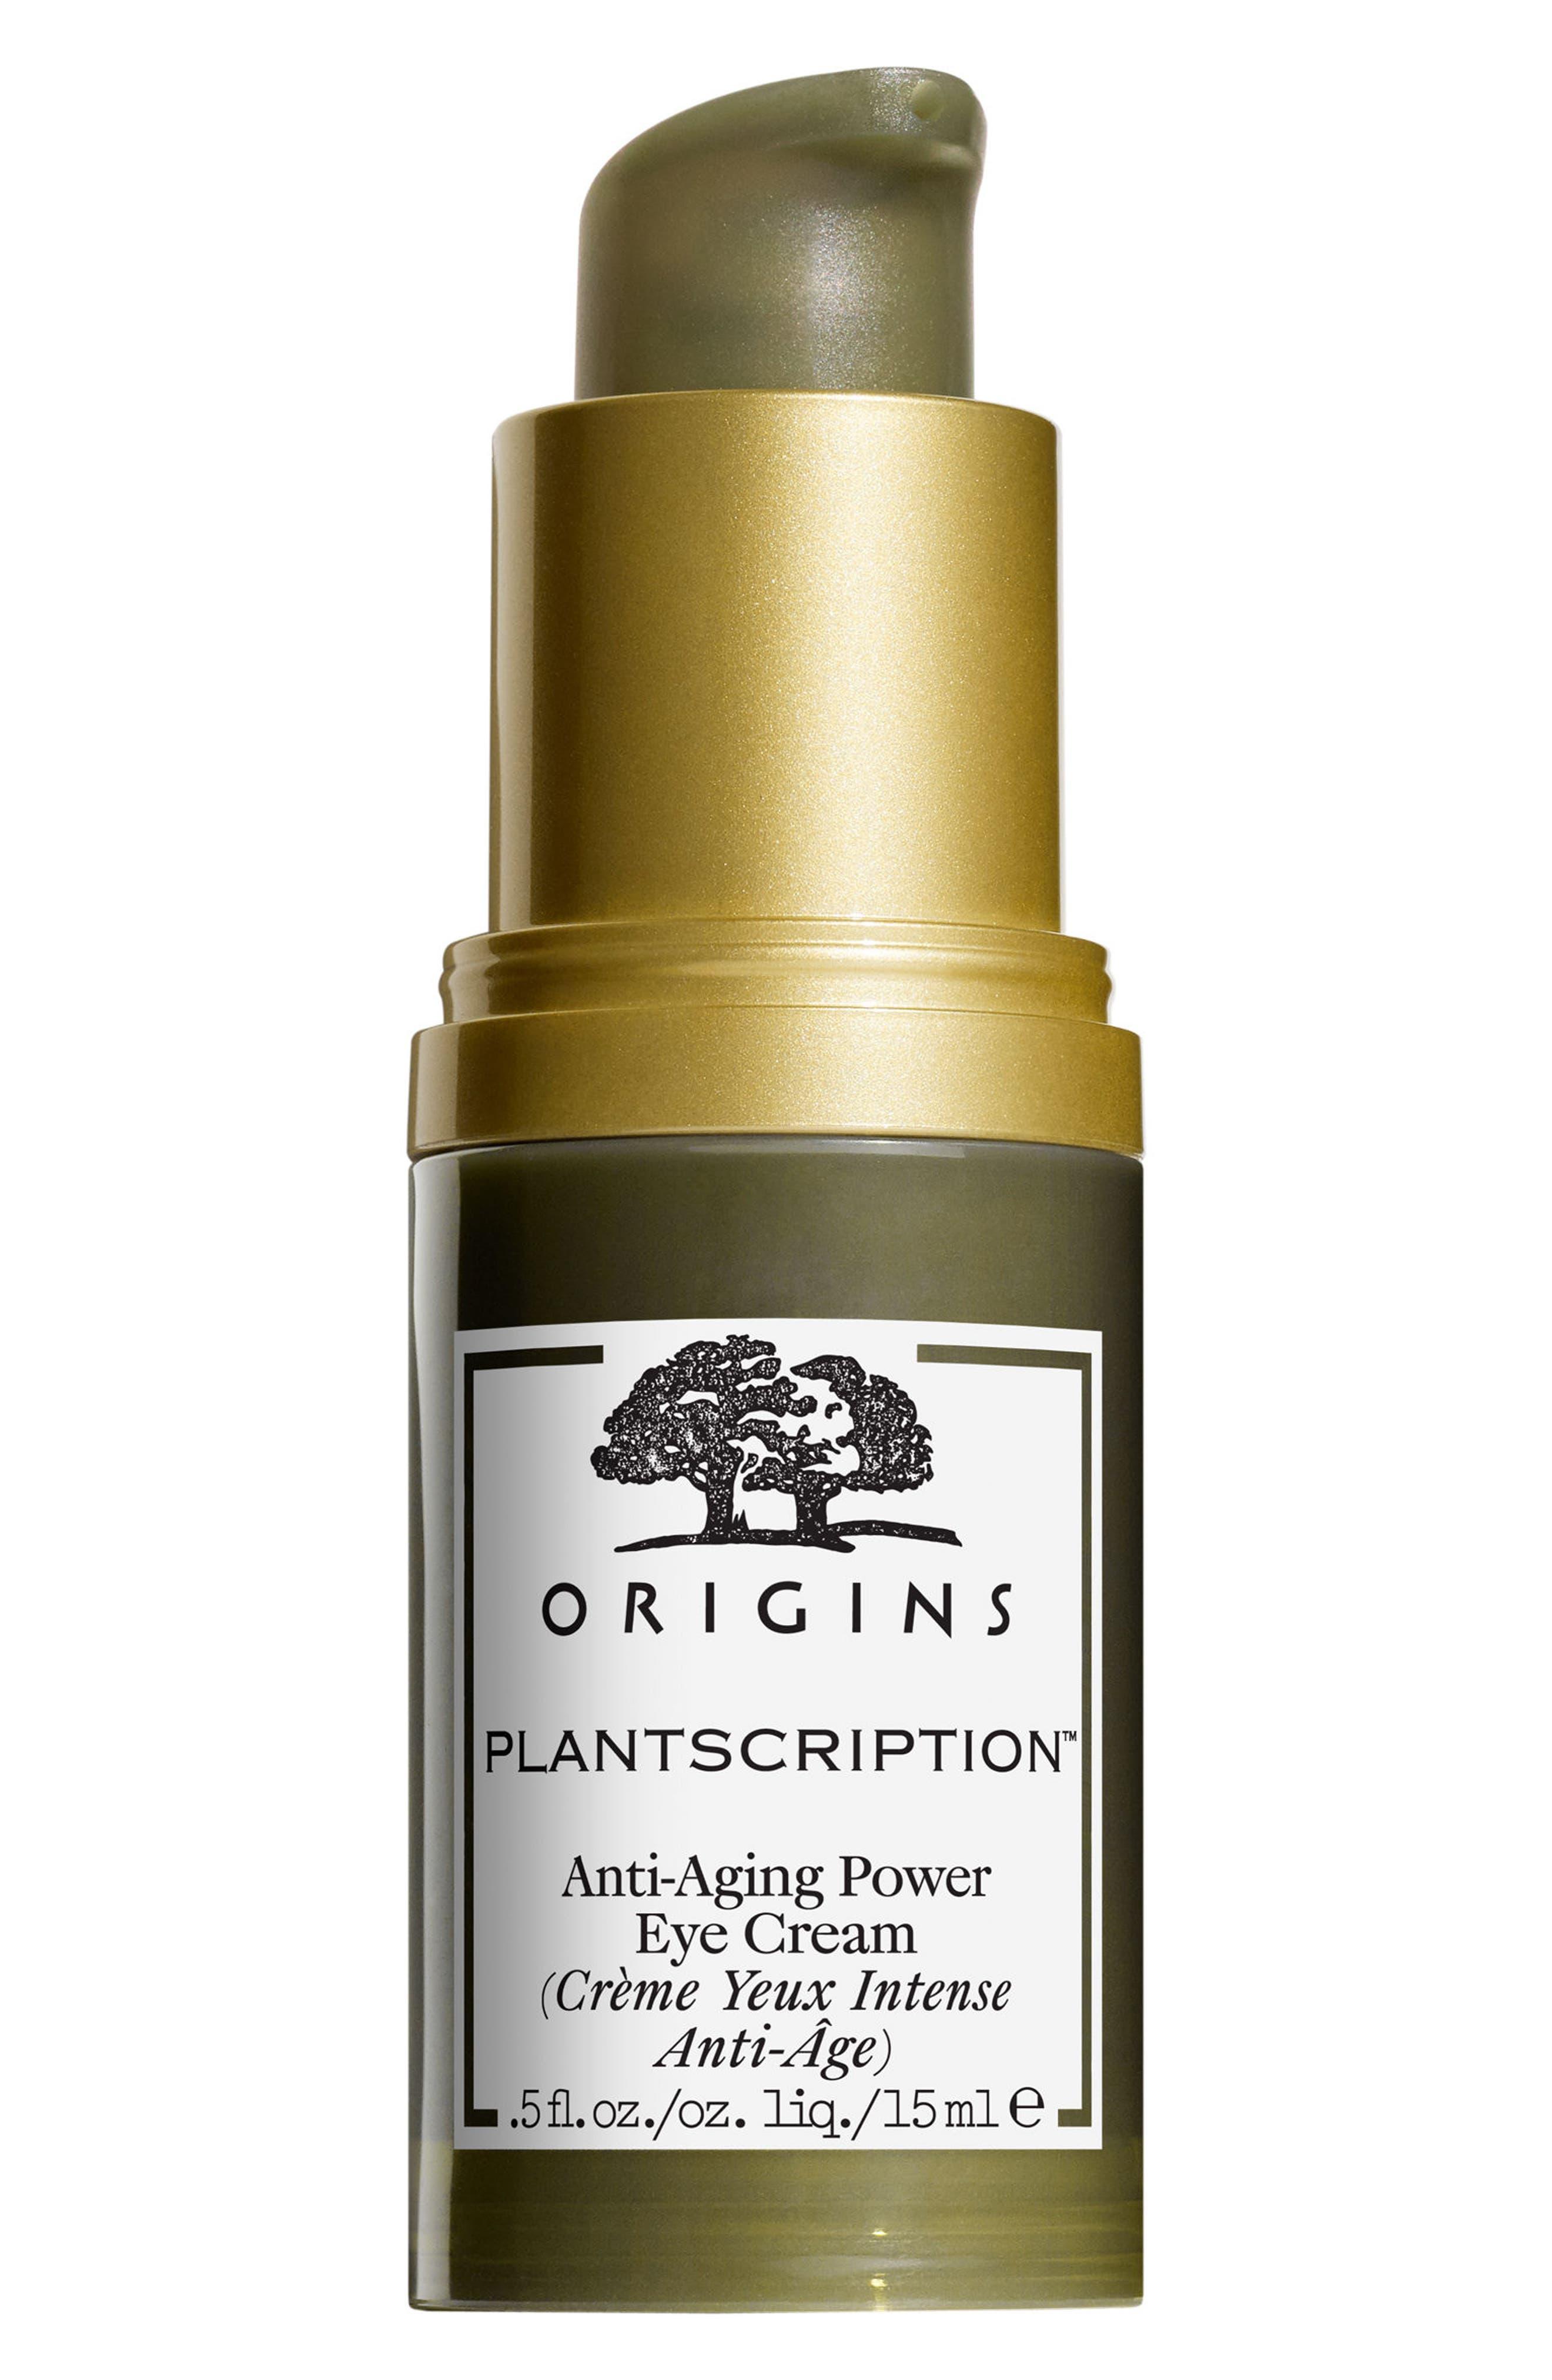 Origins Plantscription™ Anti-Aging Power Eye Cream